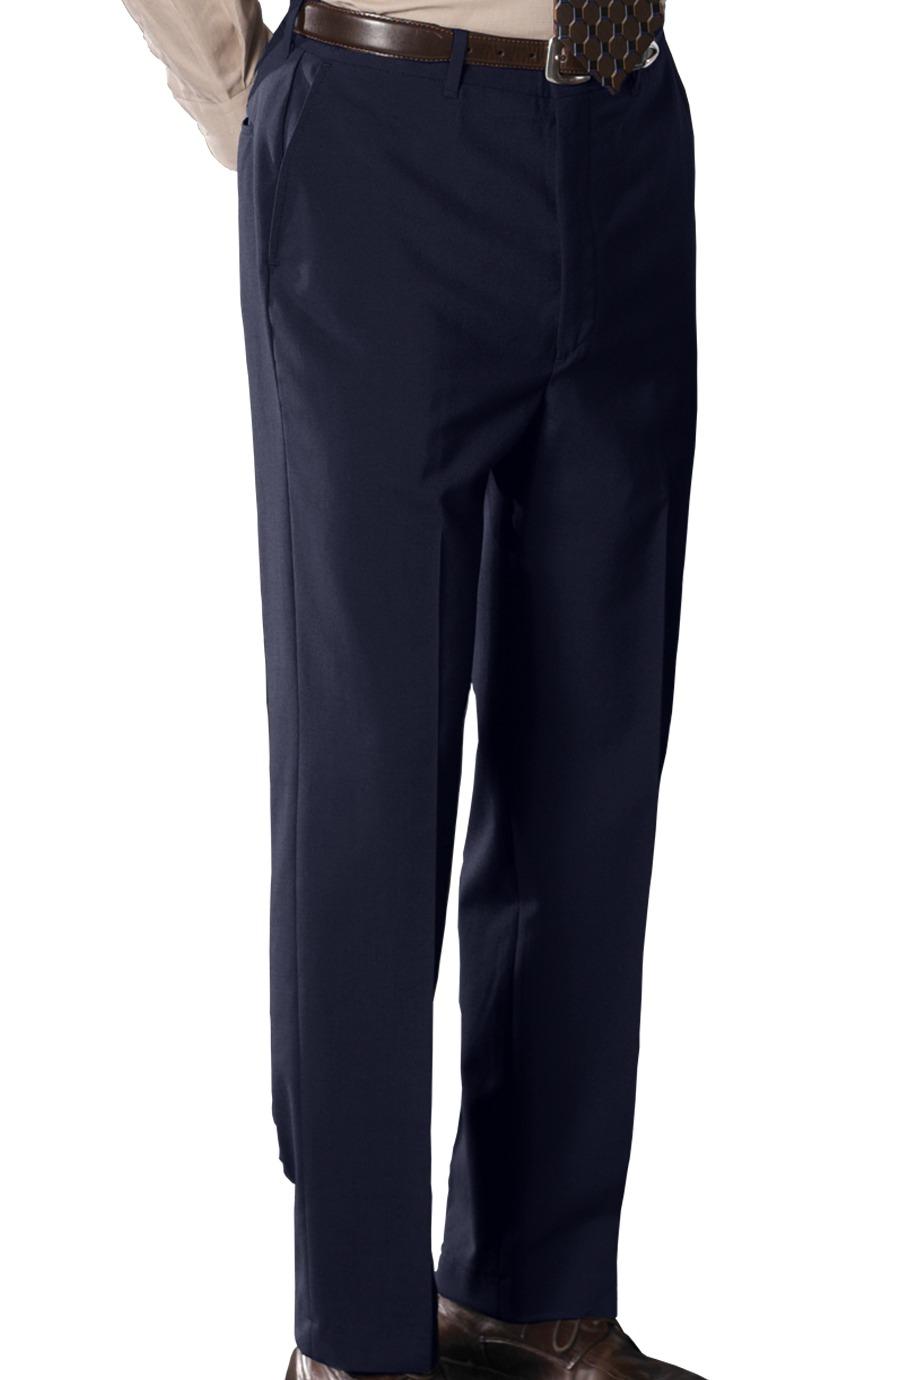 Edwards Garment 2780 - Men's Wool Blend Flat Front Pant